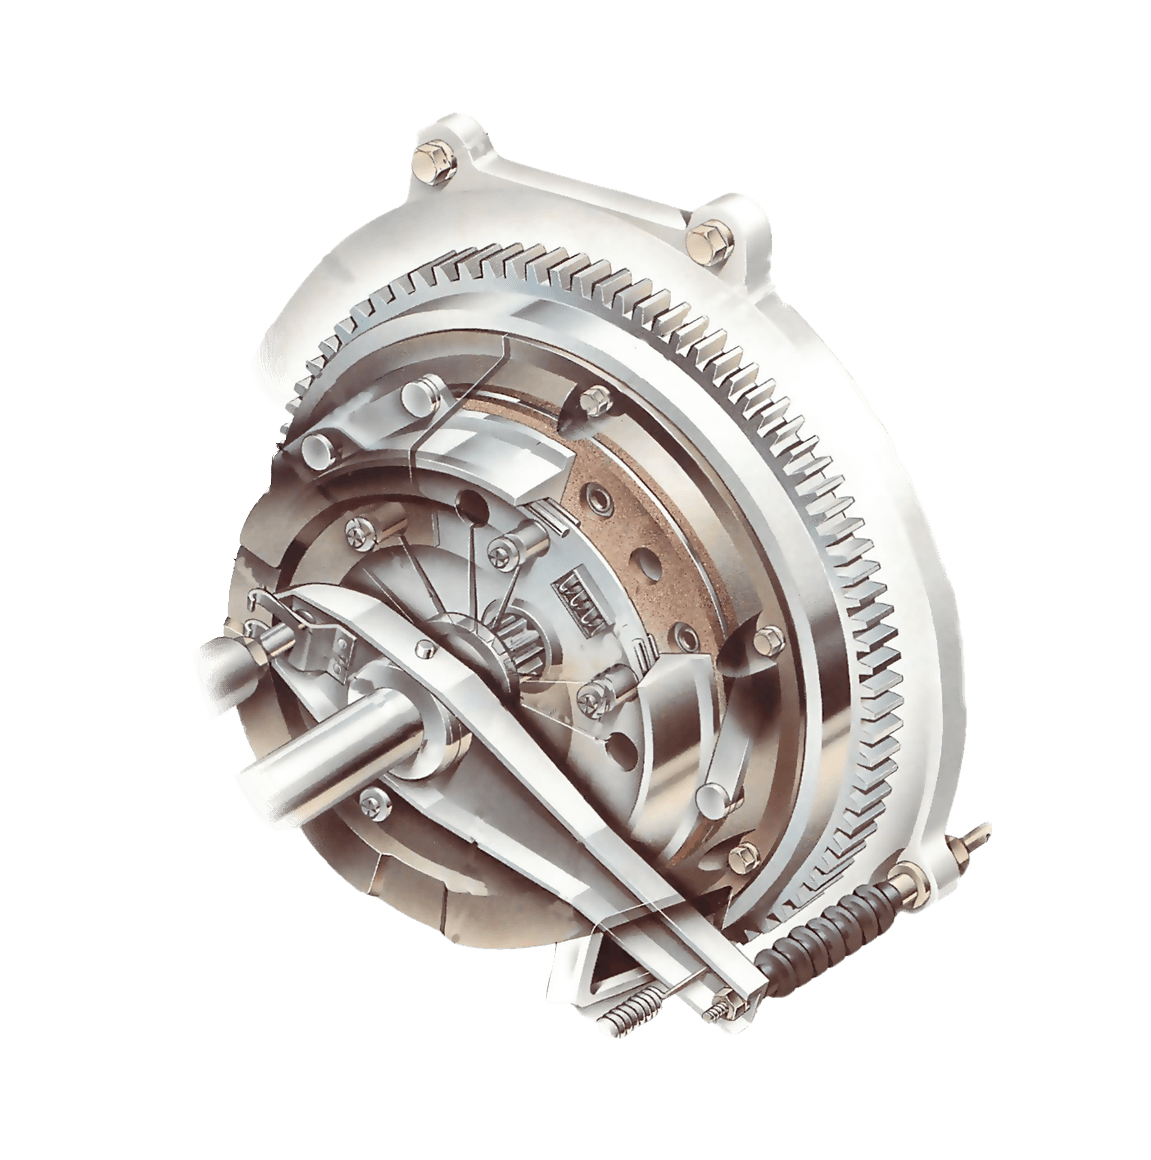 How A Car Clutch Works Speed Transmission It Diagram Cut Away Gears